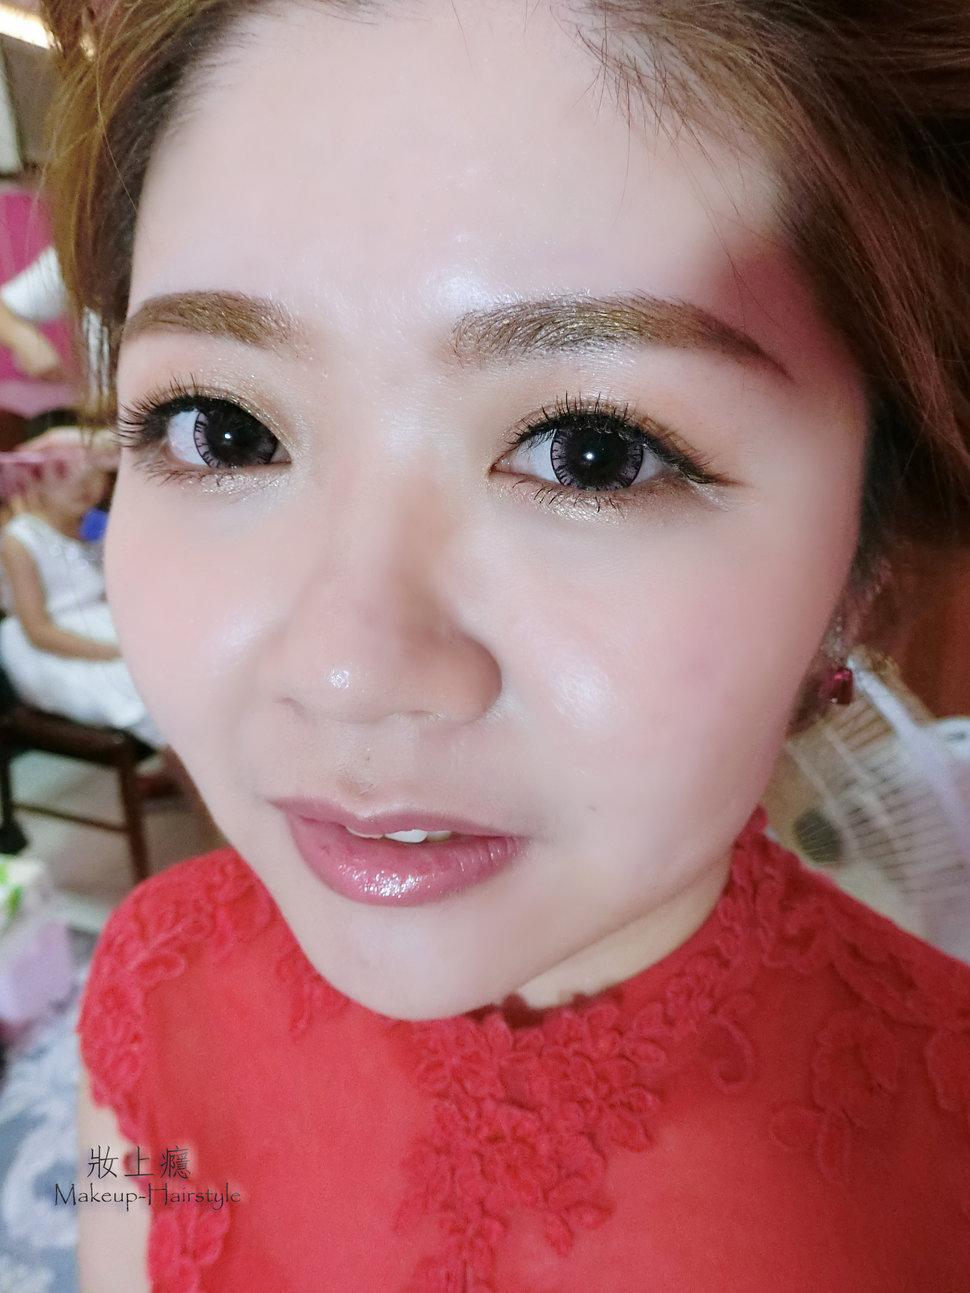 2 - Makeup-hairstyle 妝上癮 - 結婚吧一站式婚禮服務平台